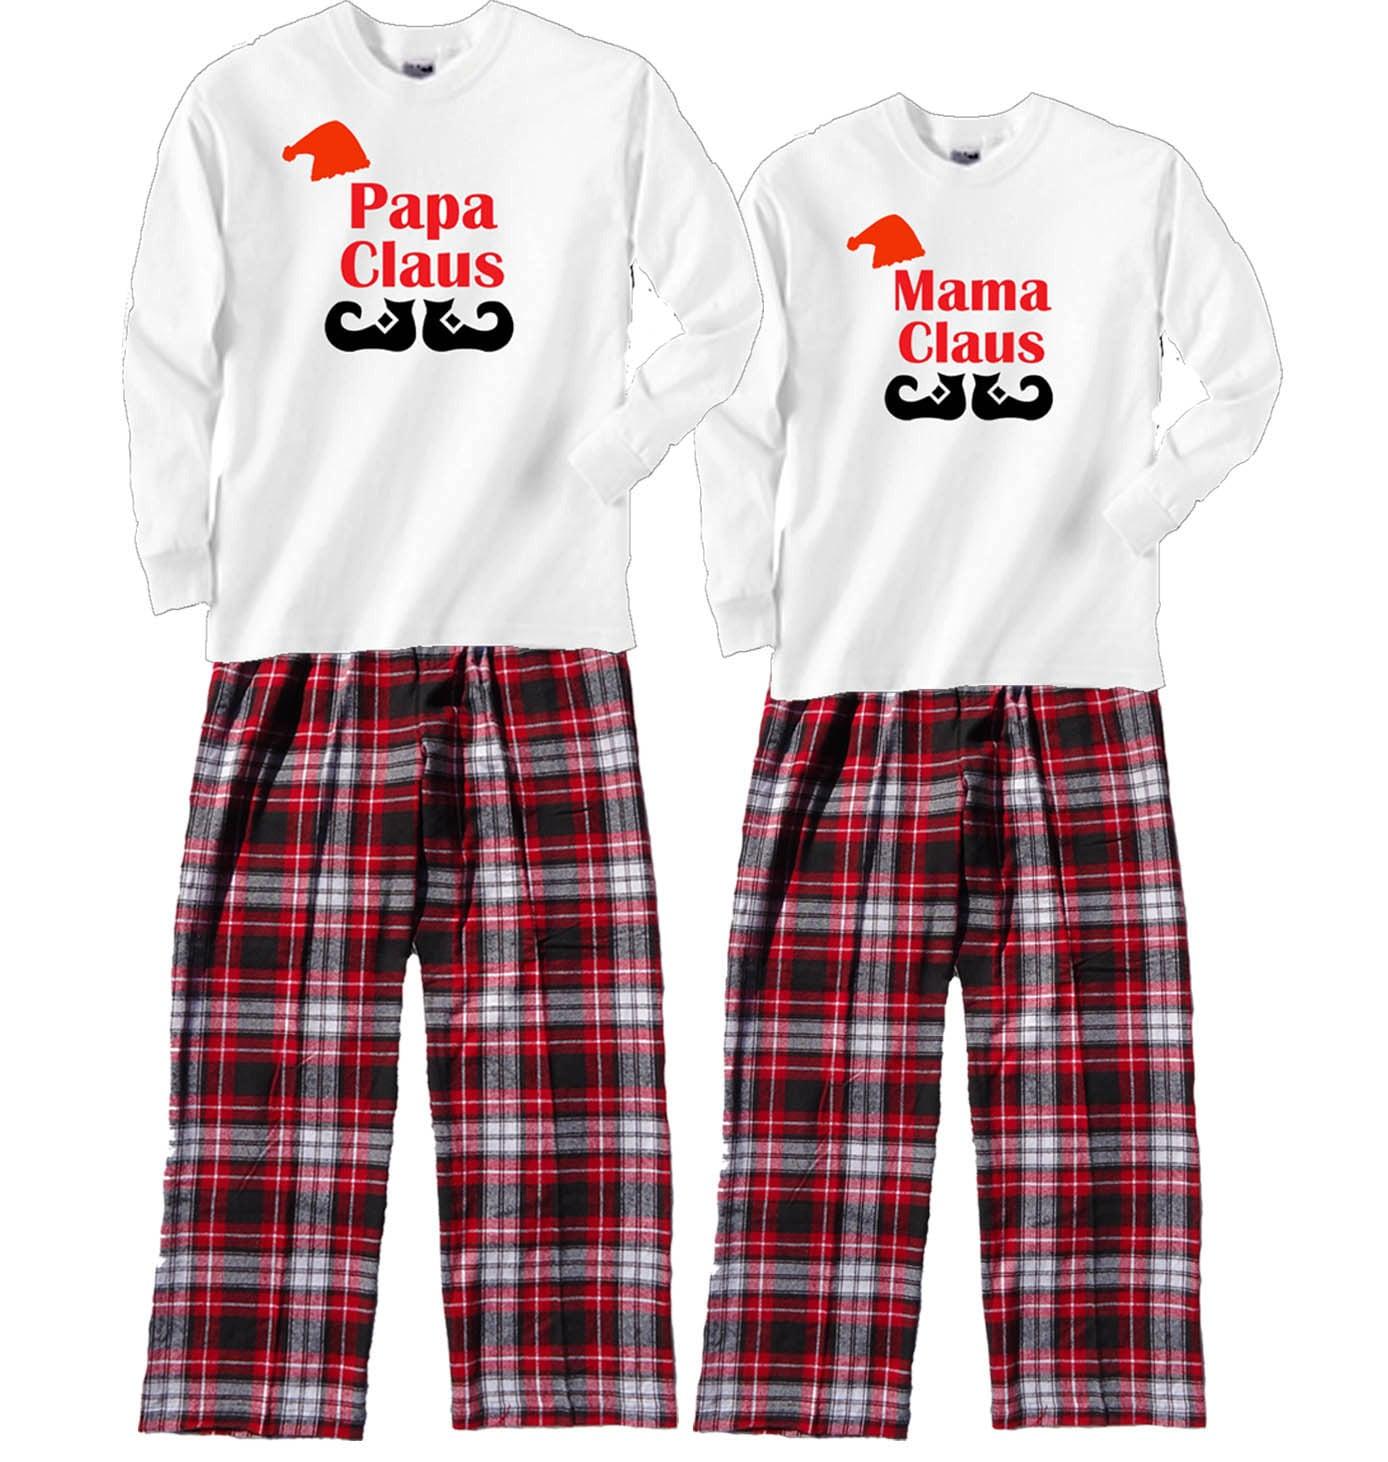 Christmas Pajamas For Whole Family